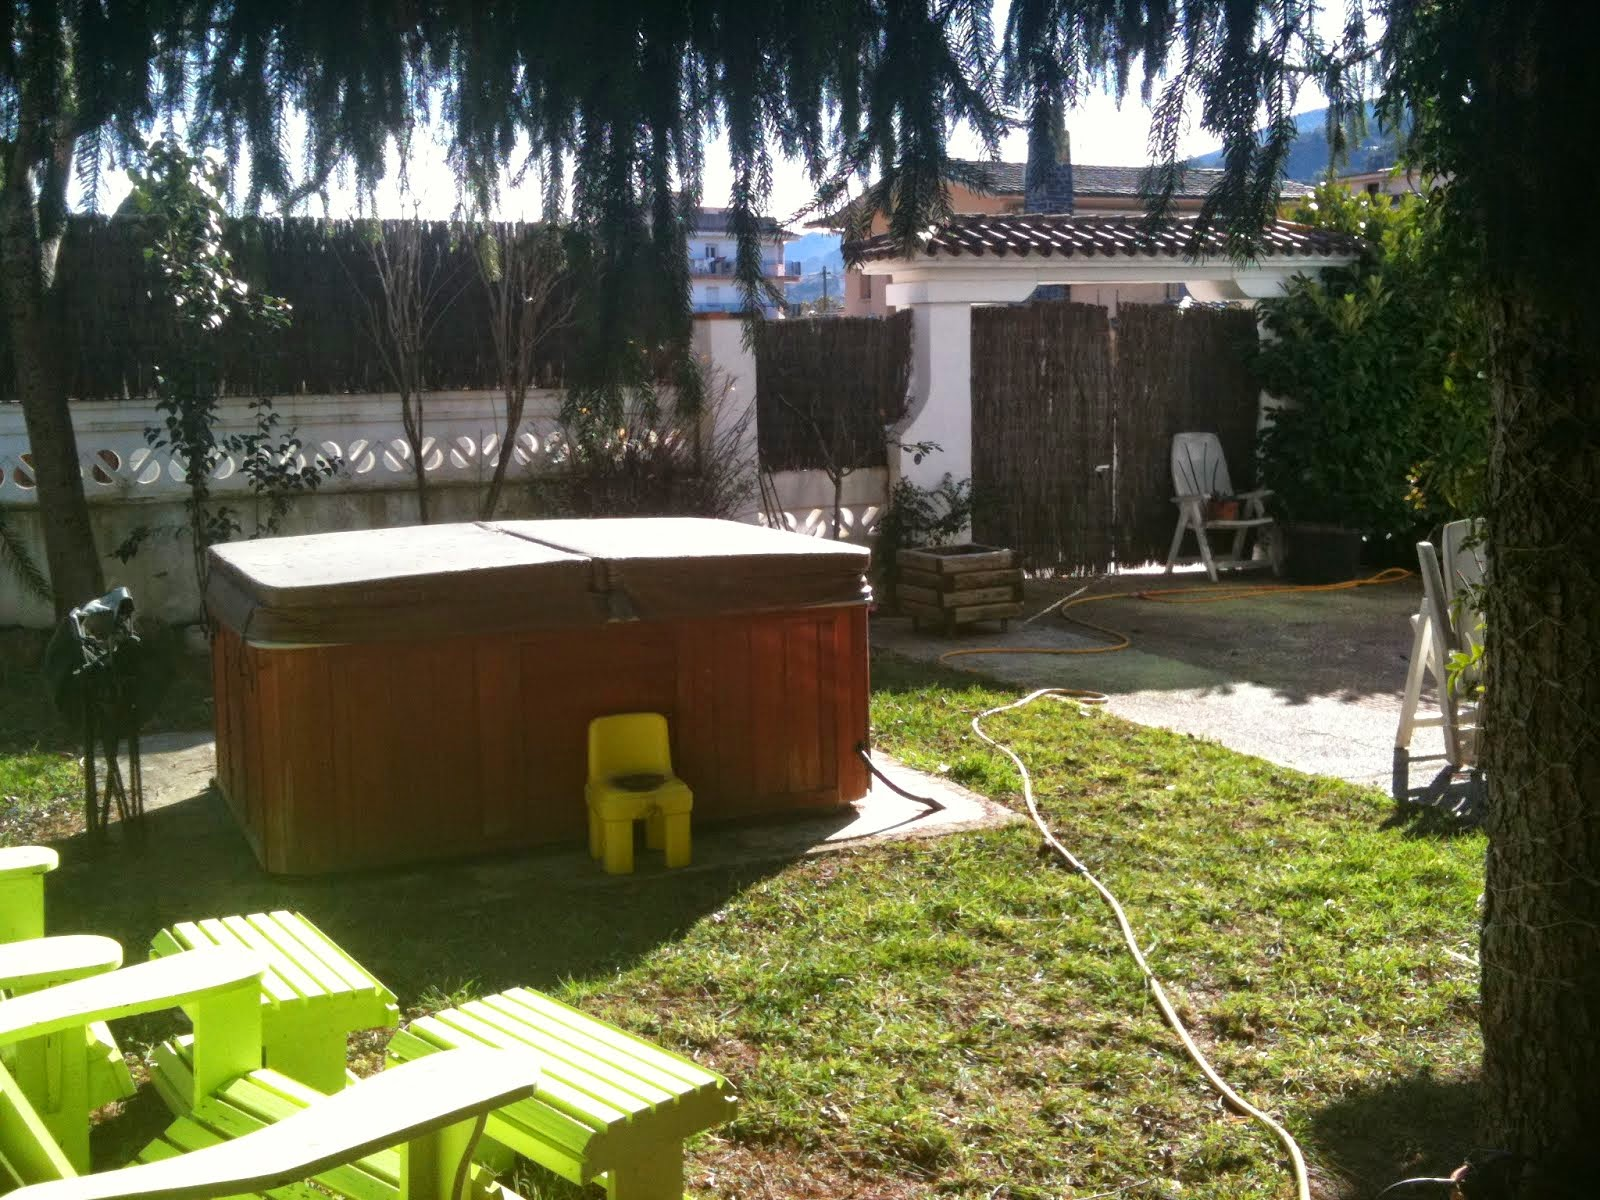 jardi amb jacuzzi